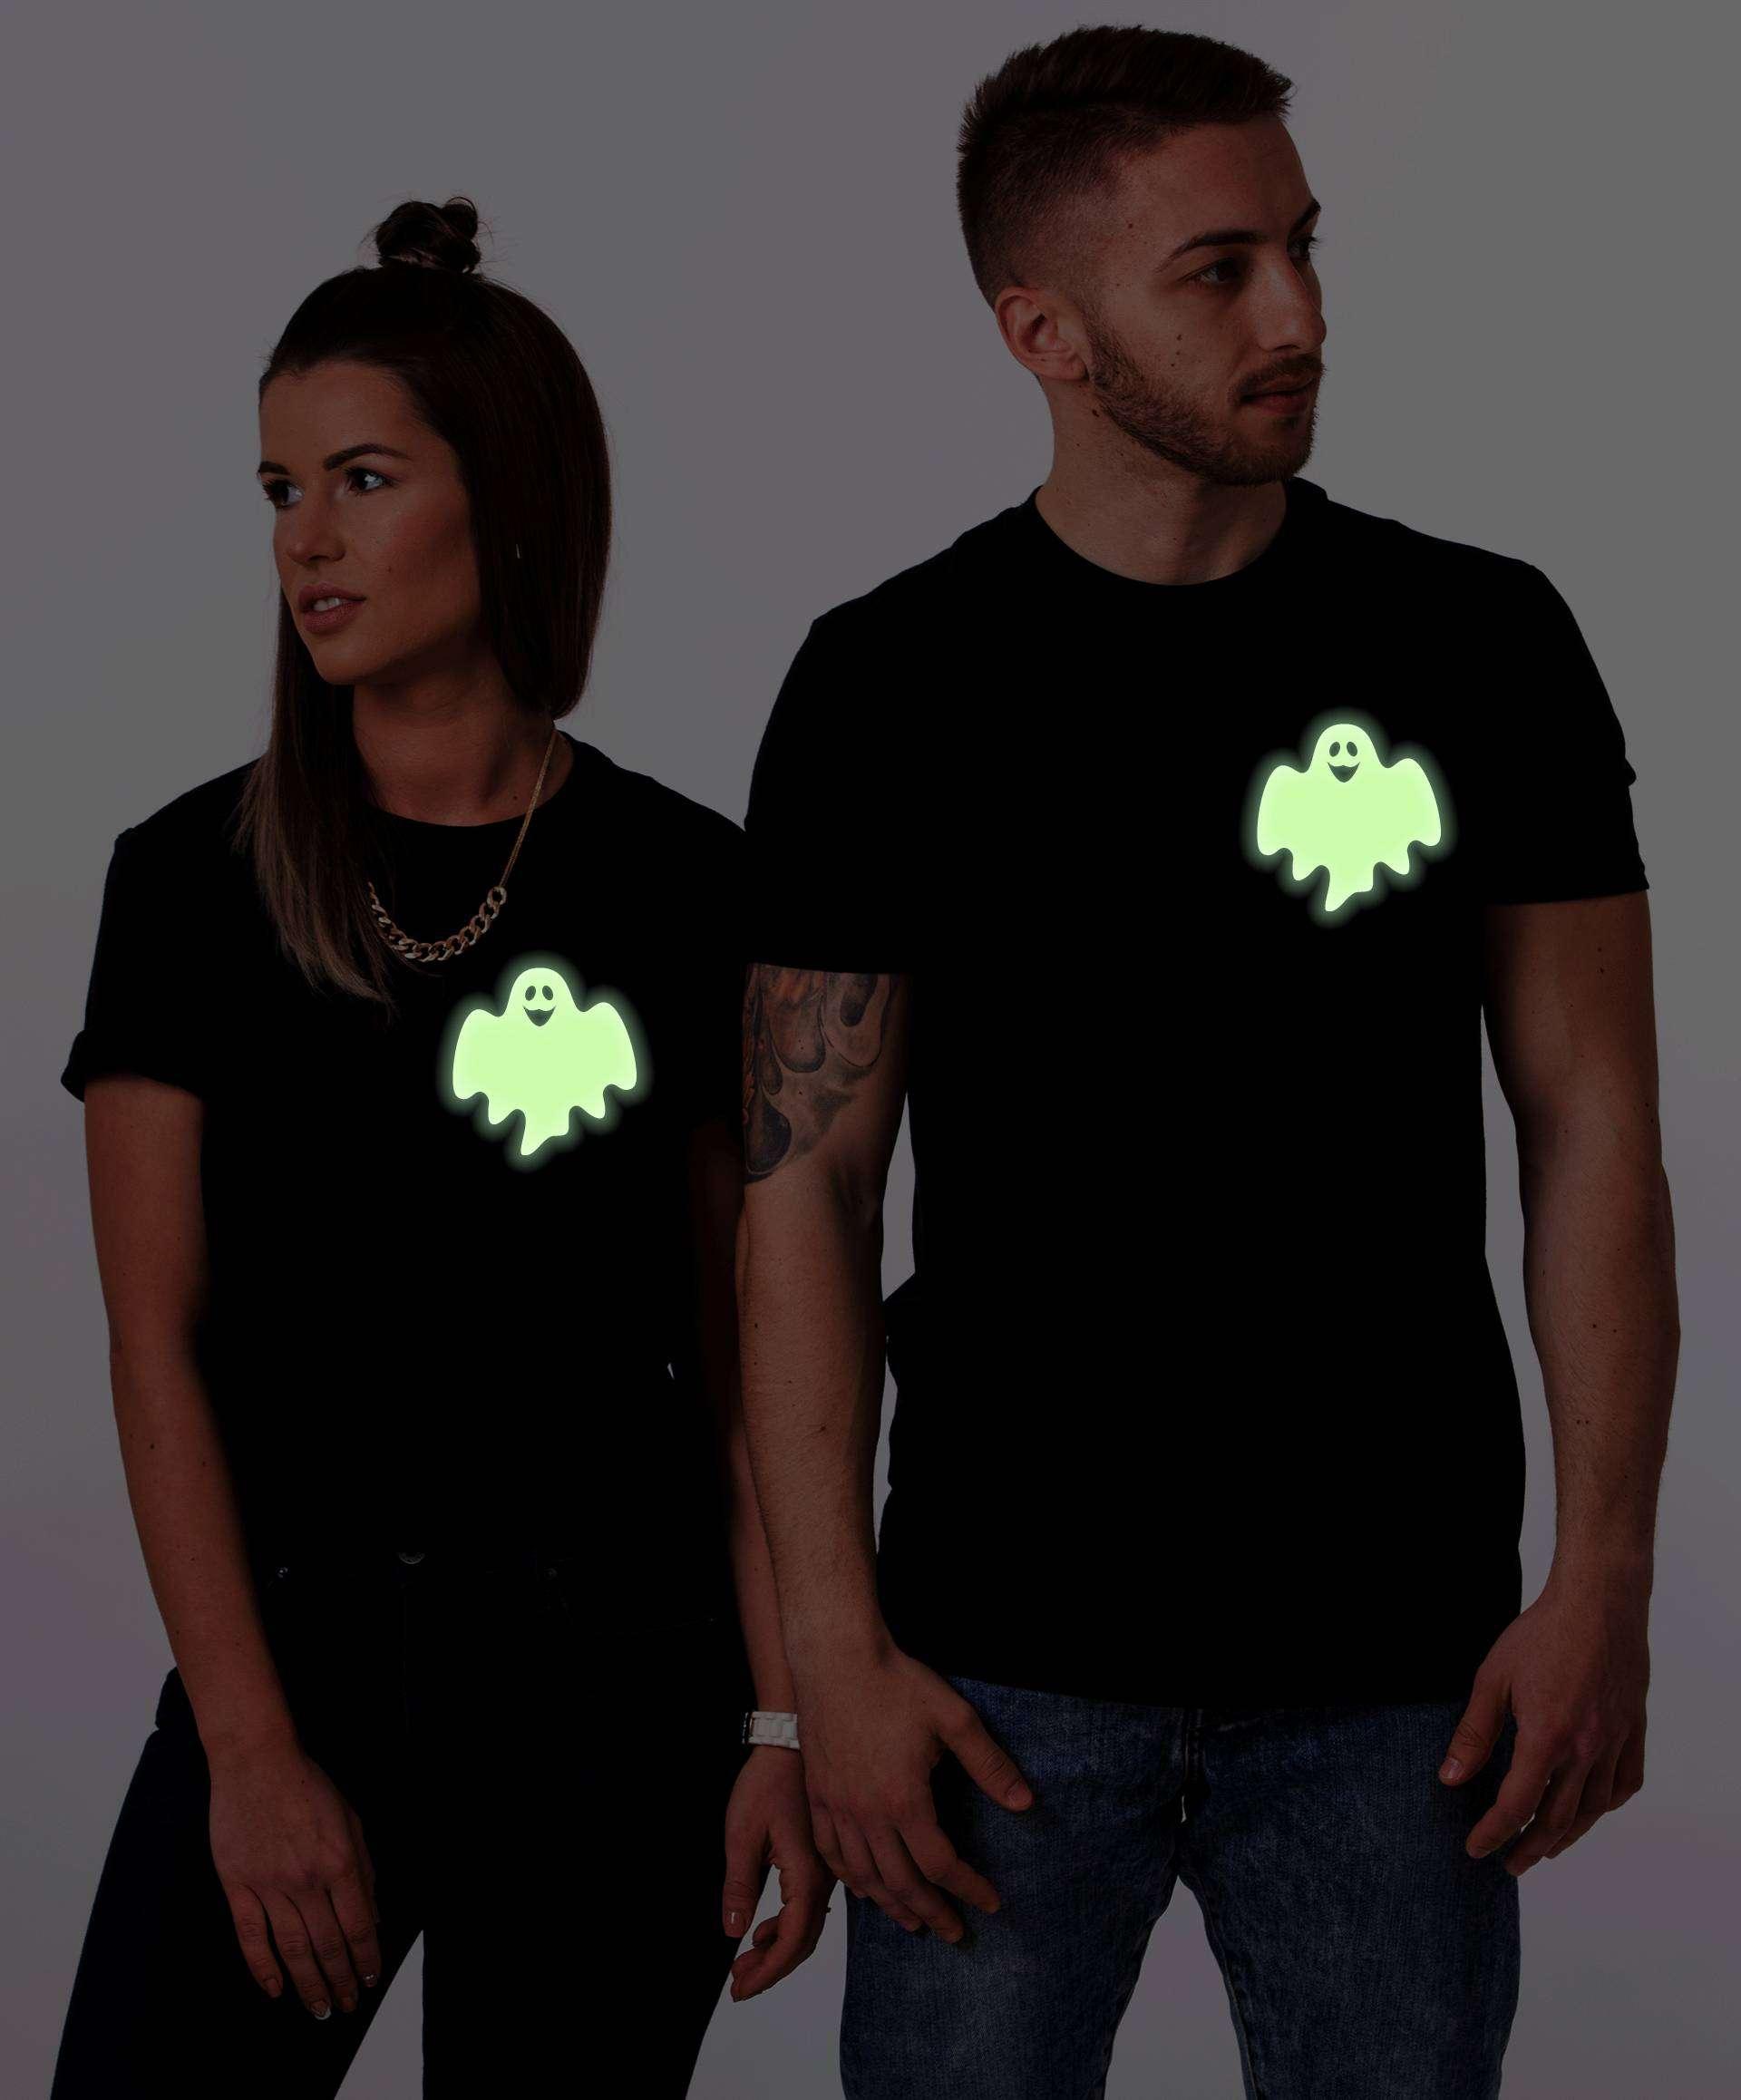 glow in the dark halloween shirts bat zombie ghost halloween shirts